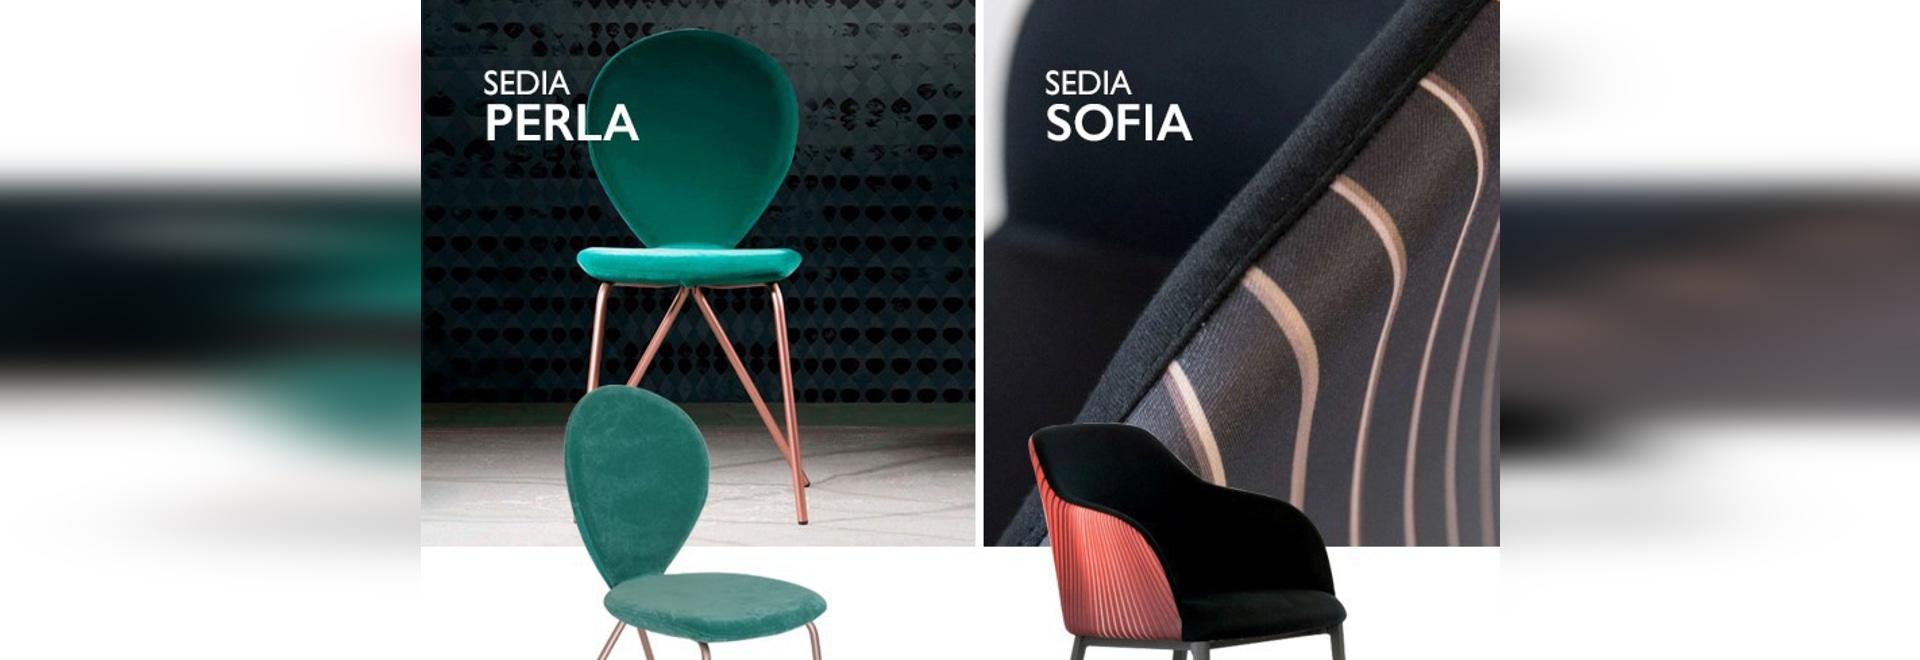 Sofia and Perla